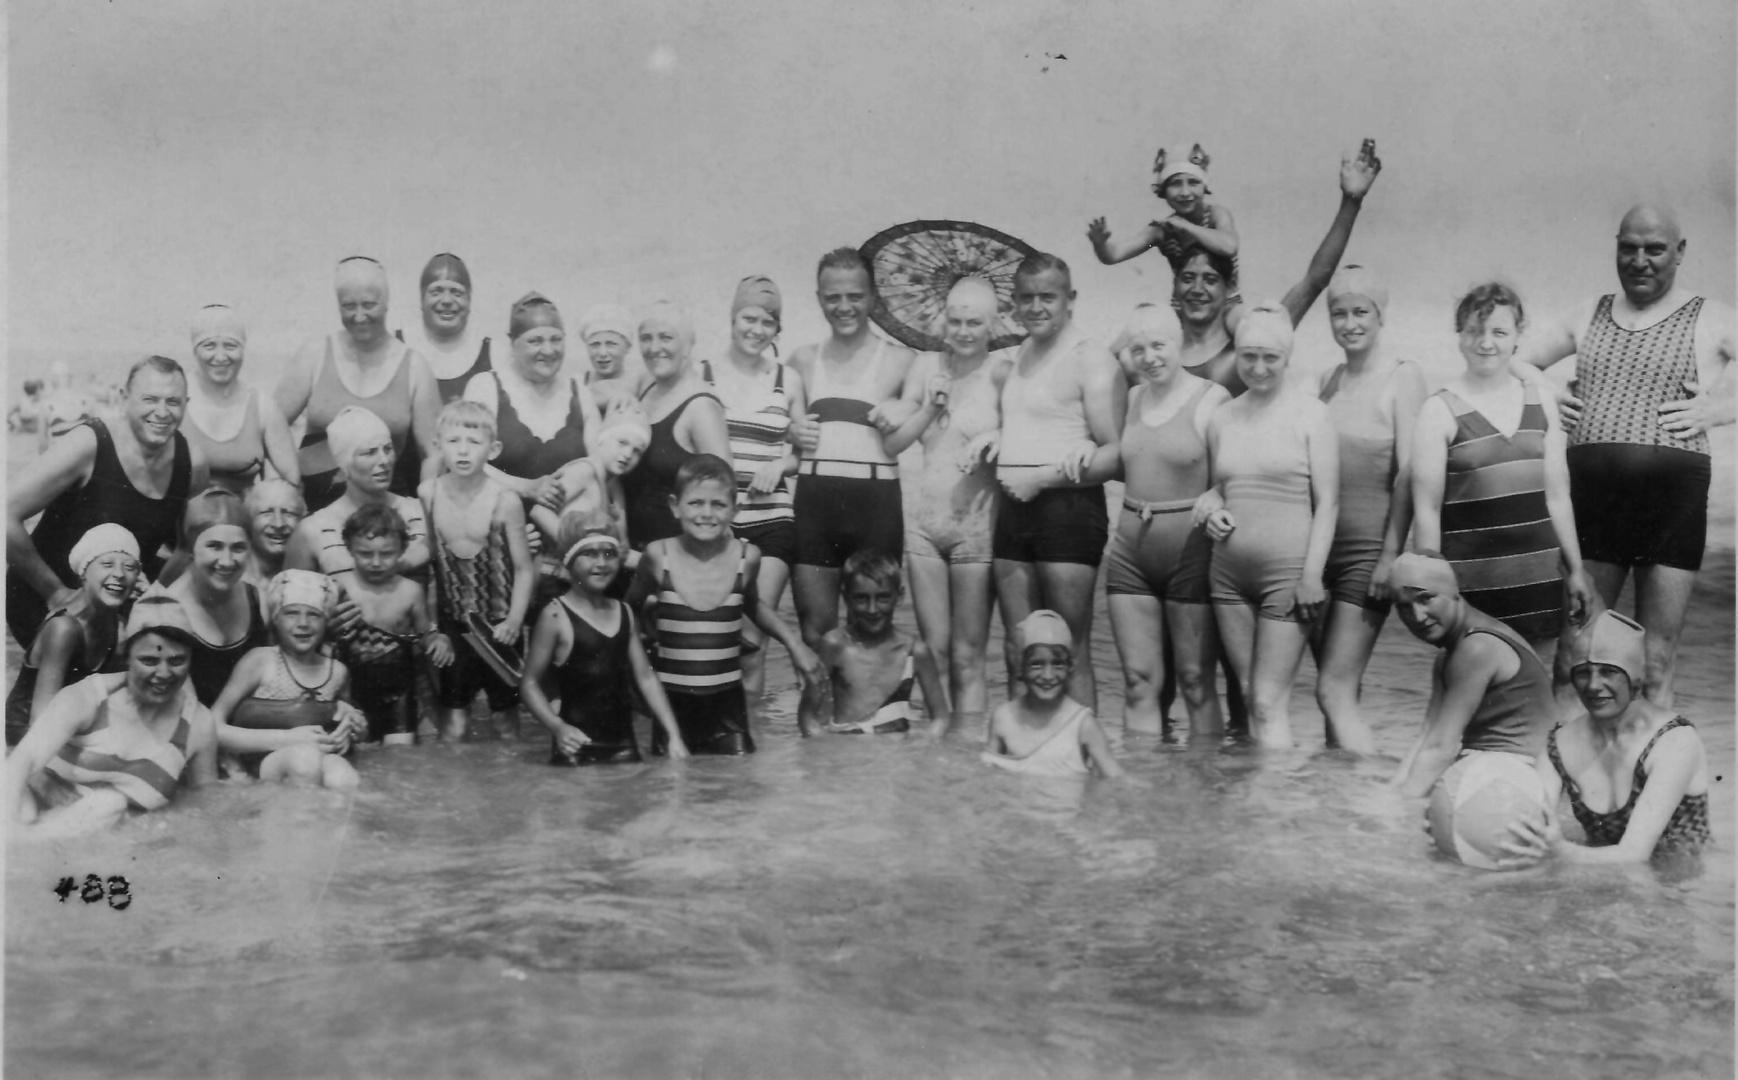 Badegesellschaft